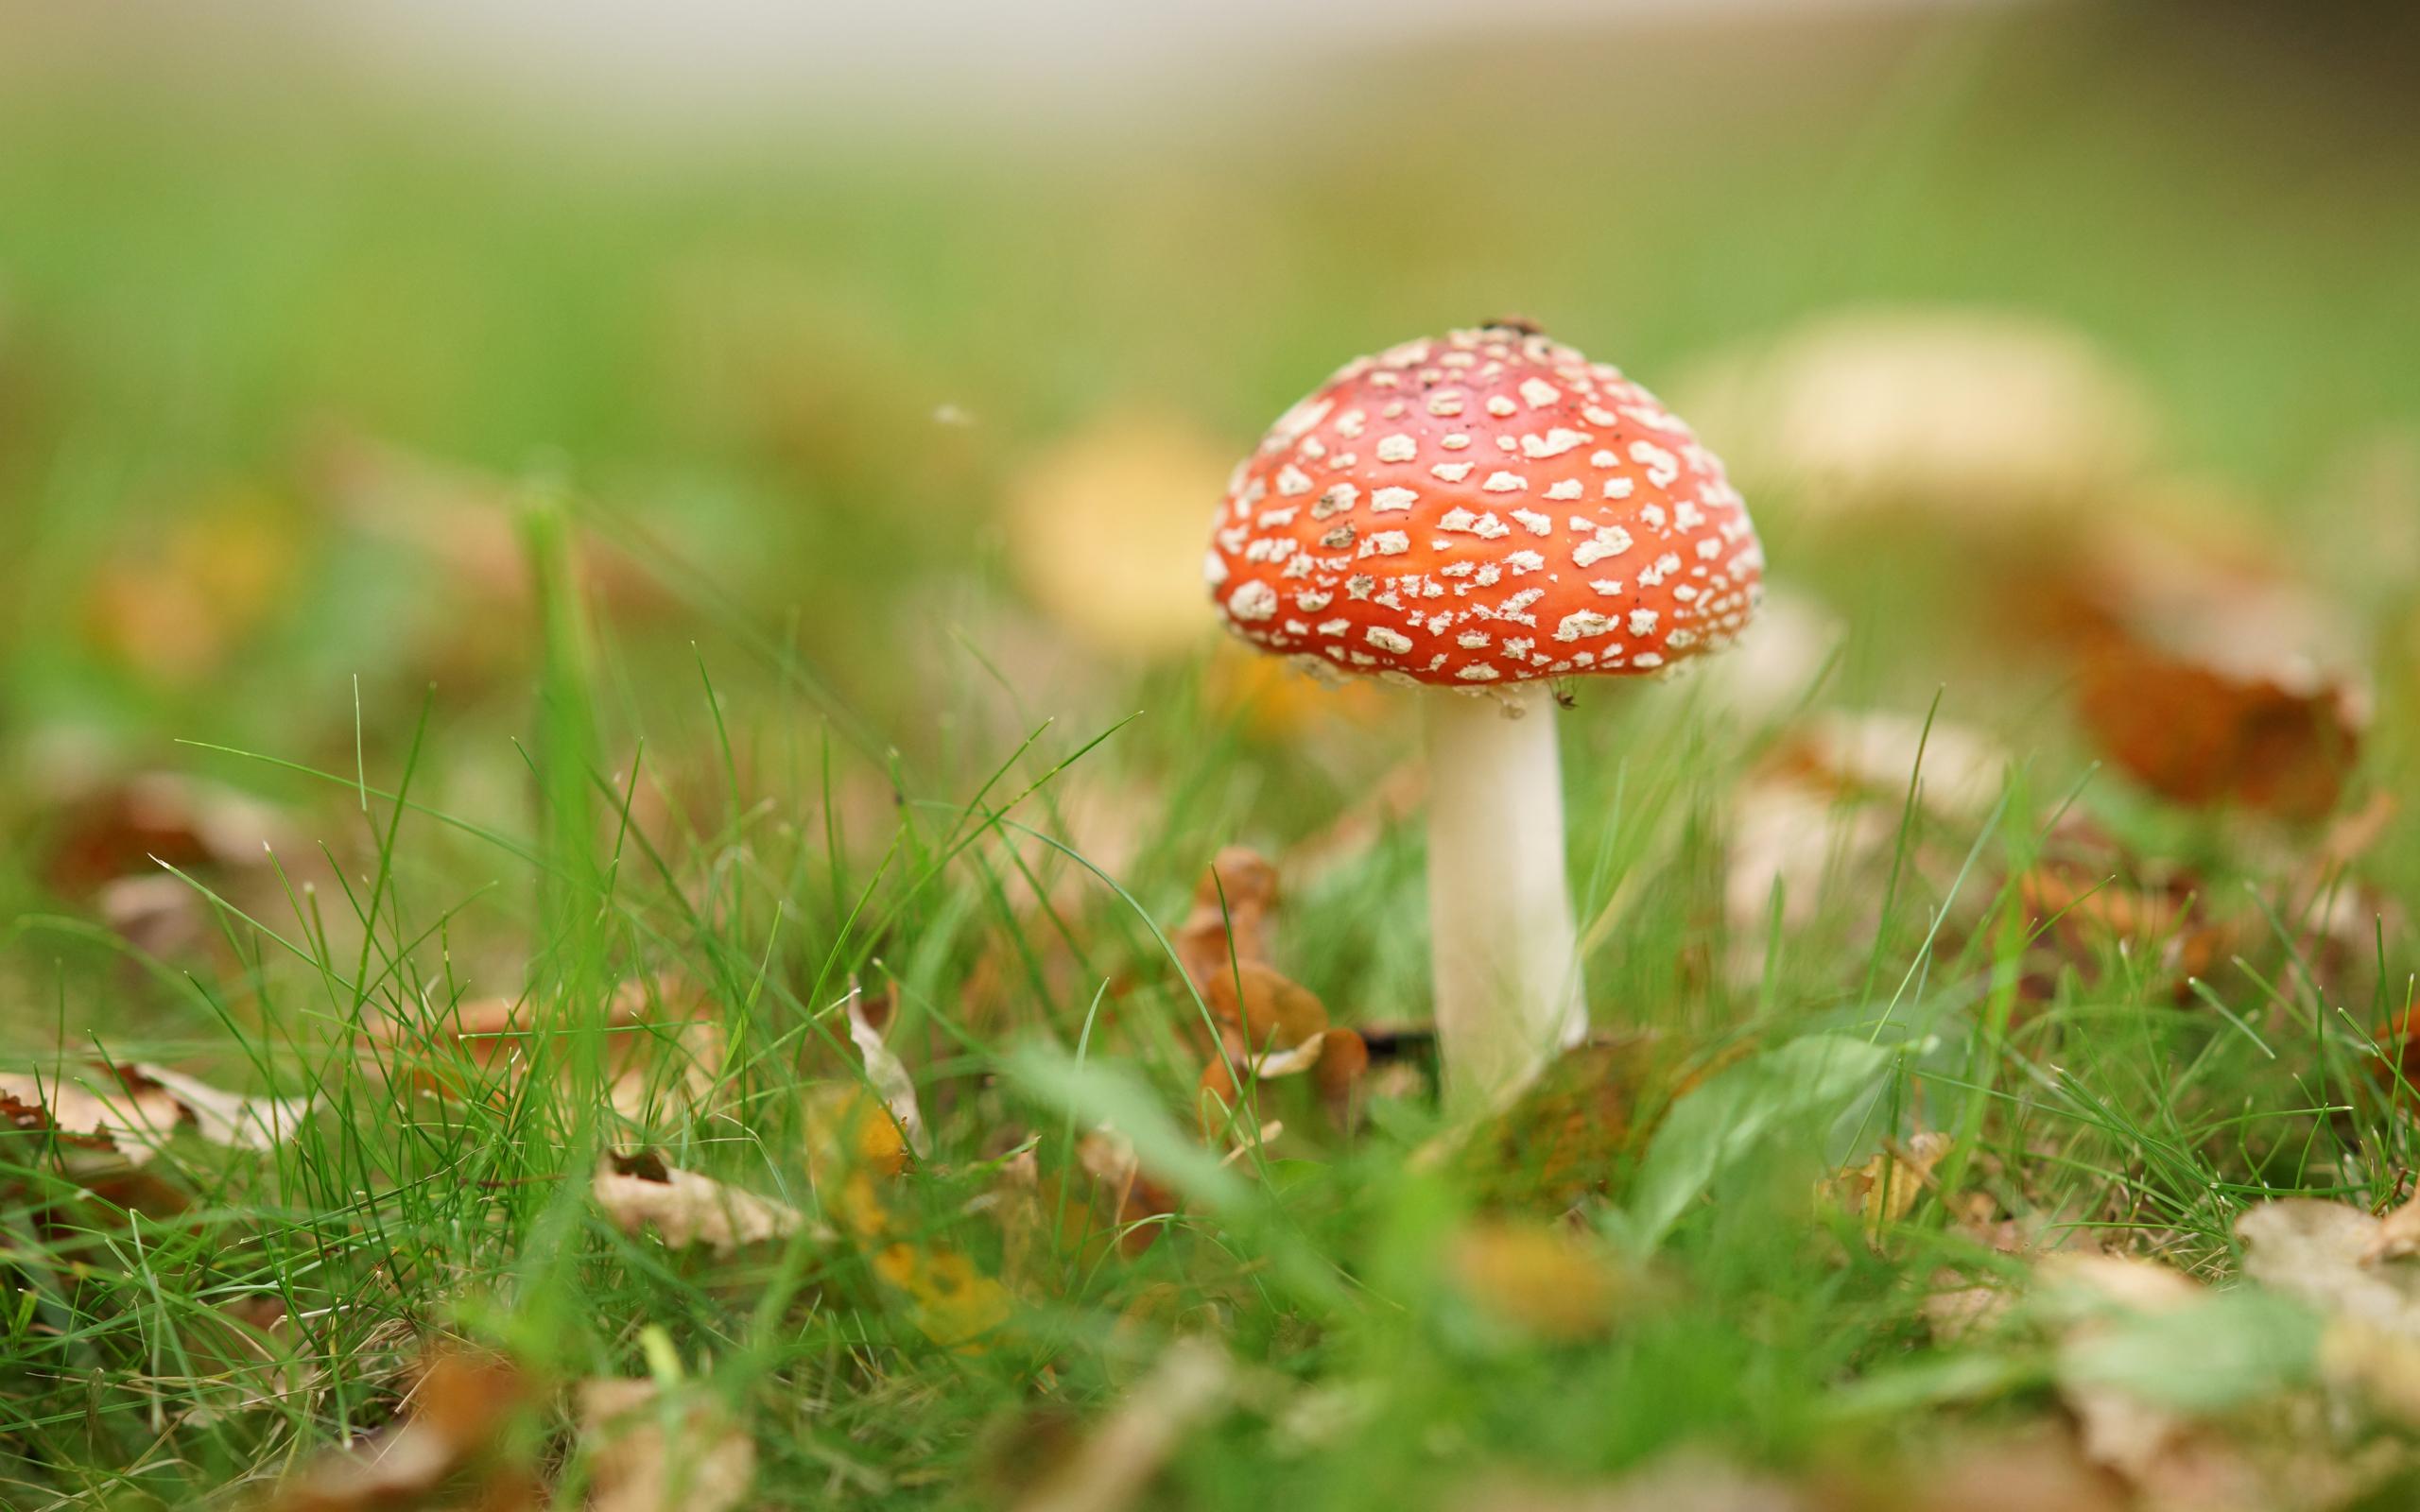 mushroom family wallpaper desktop - photo #9